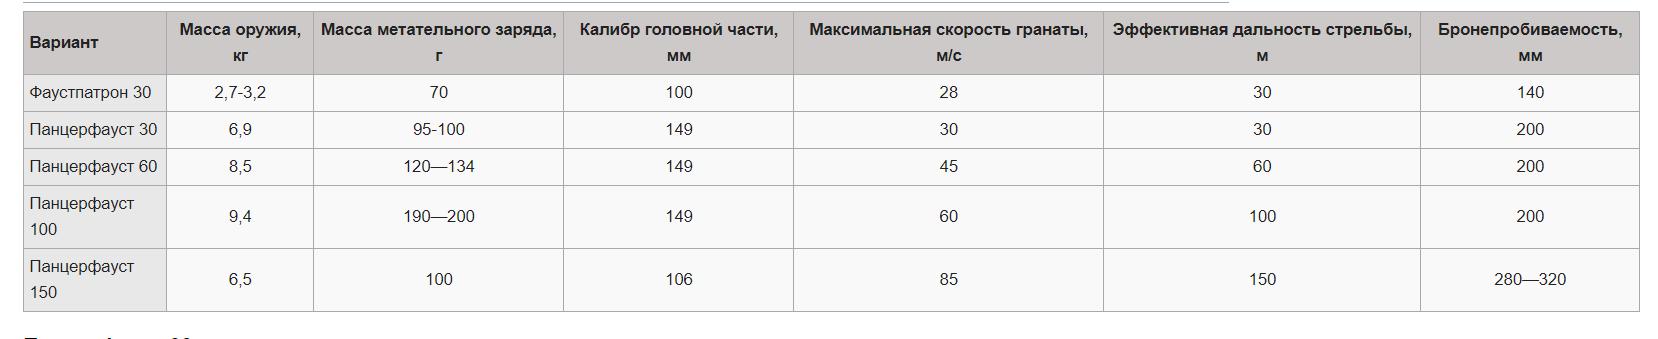 https://images.vfl.ru/ii/1551455344/44f51f97/25597797.png